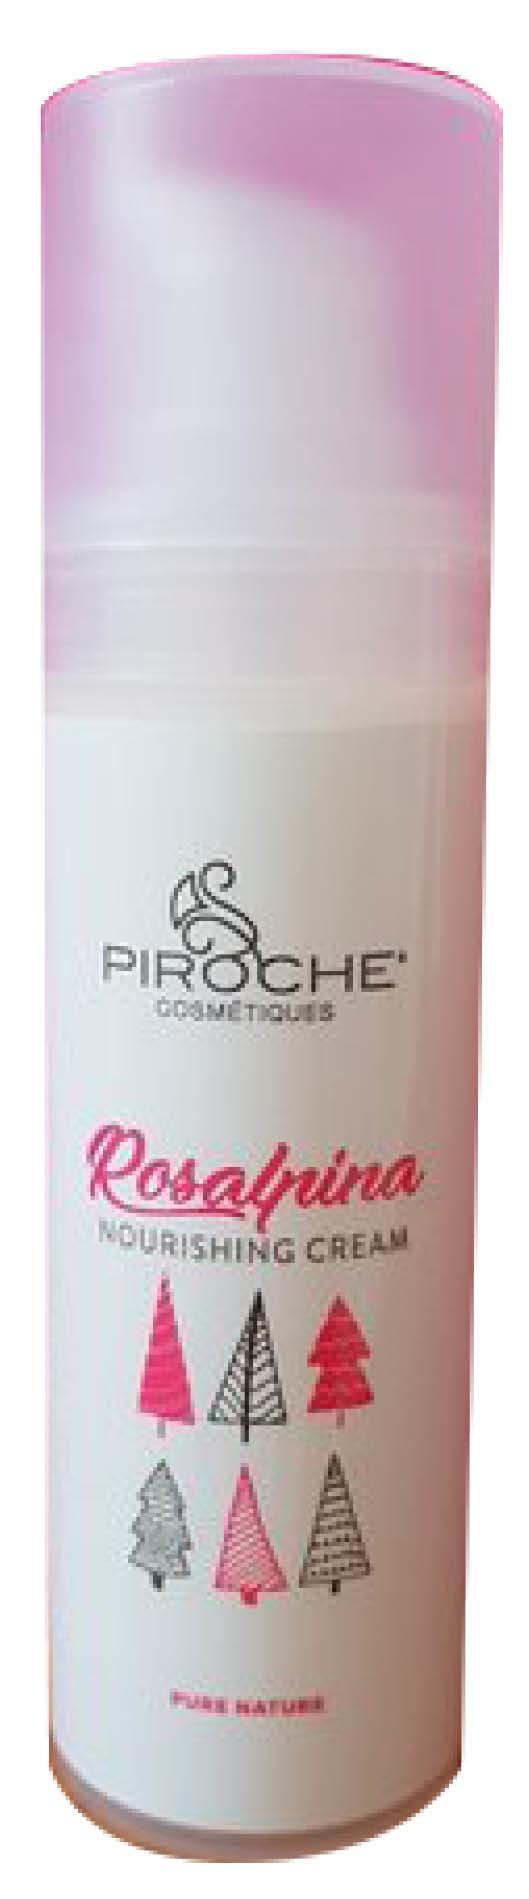 Piroche Cosmétiques Face Care - Nourishing Cream Rosalpina